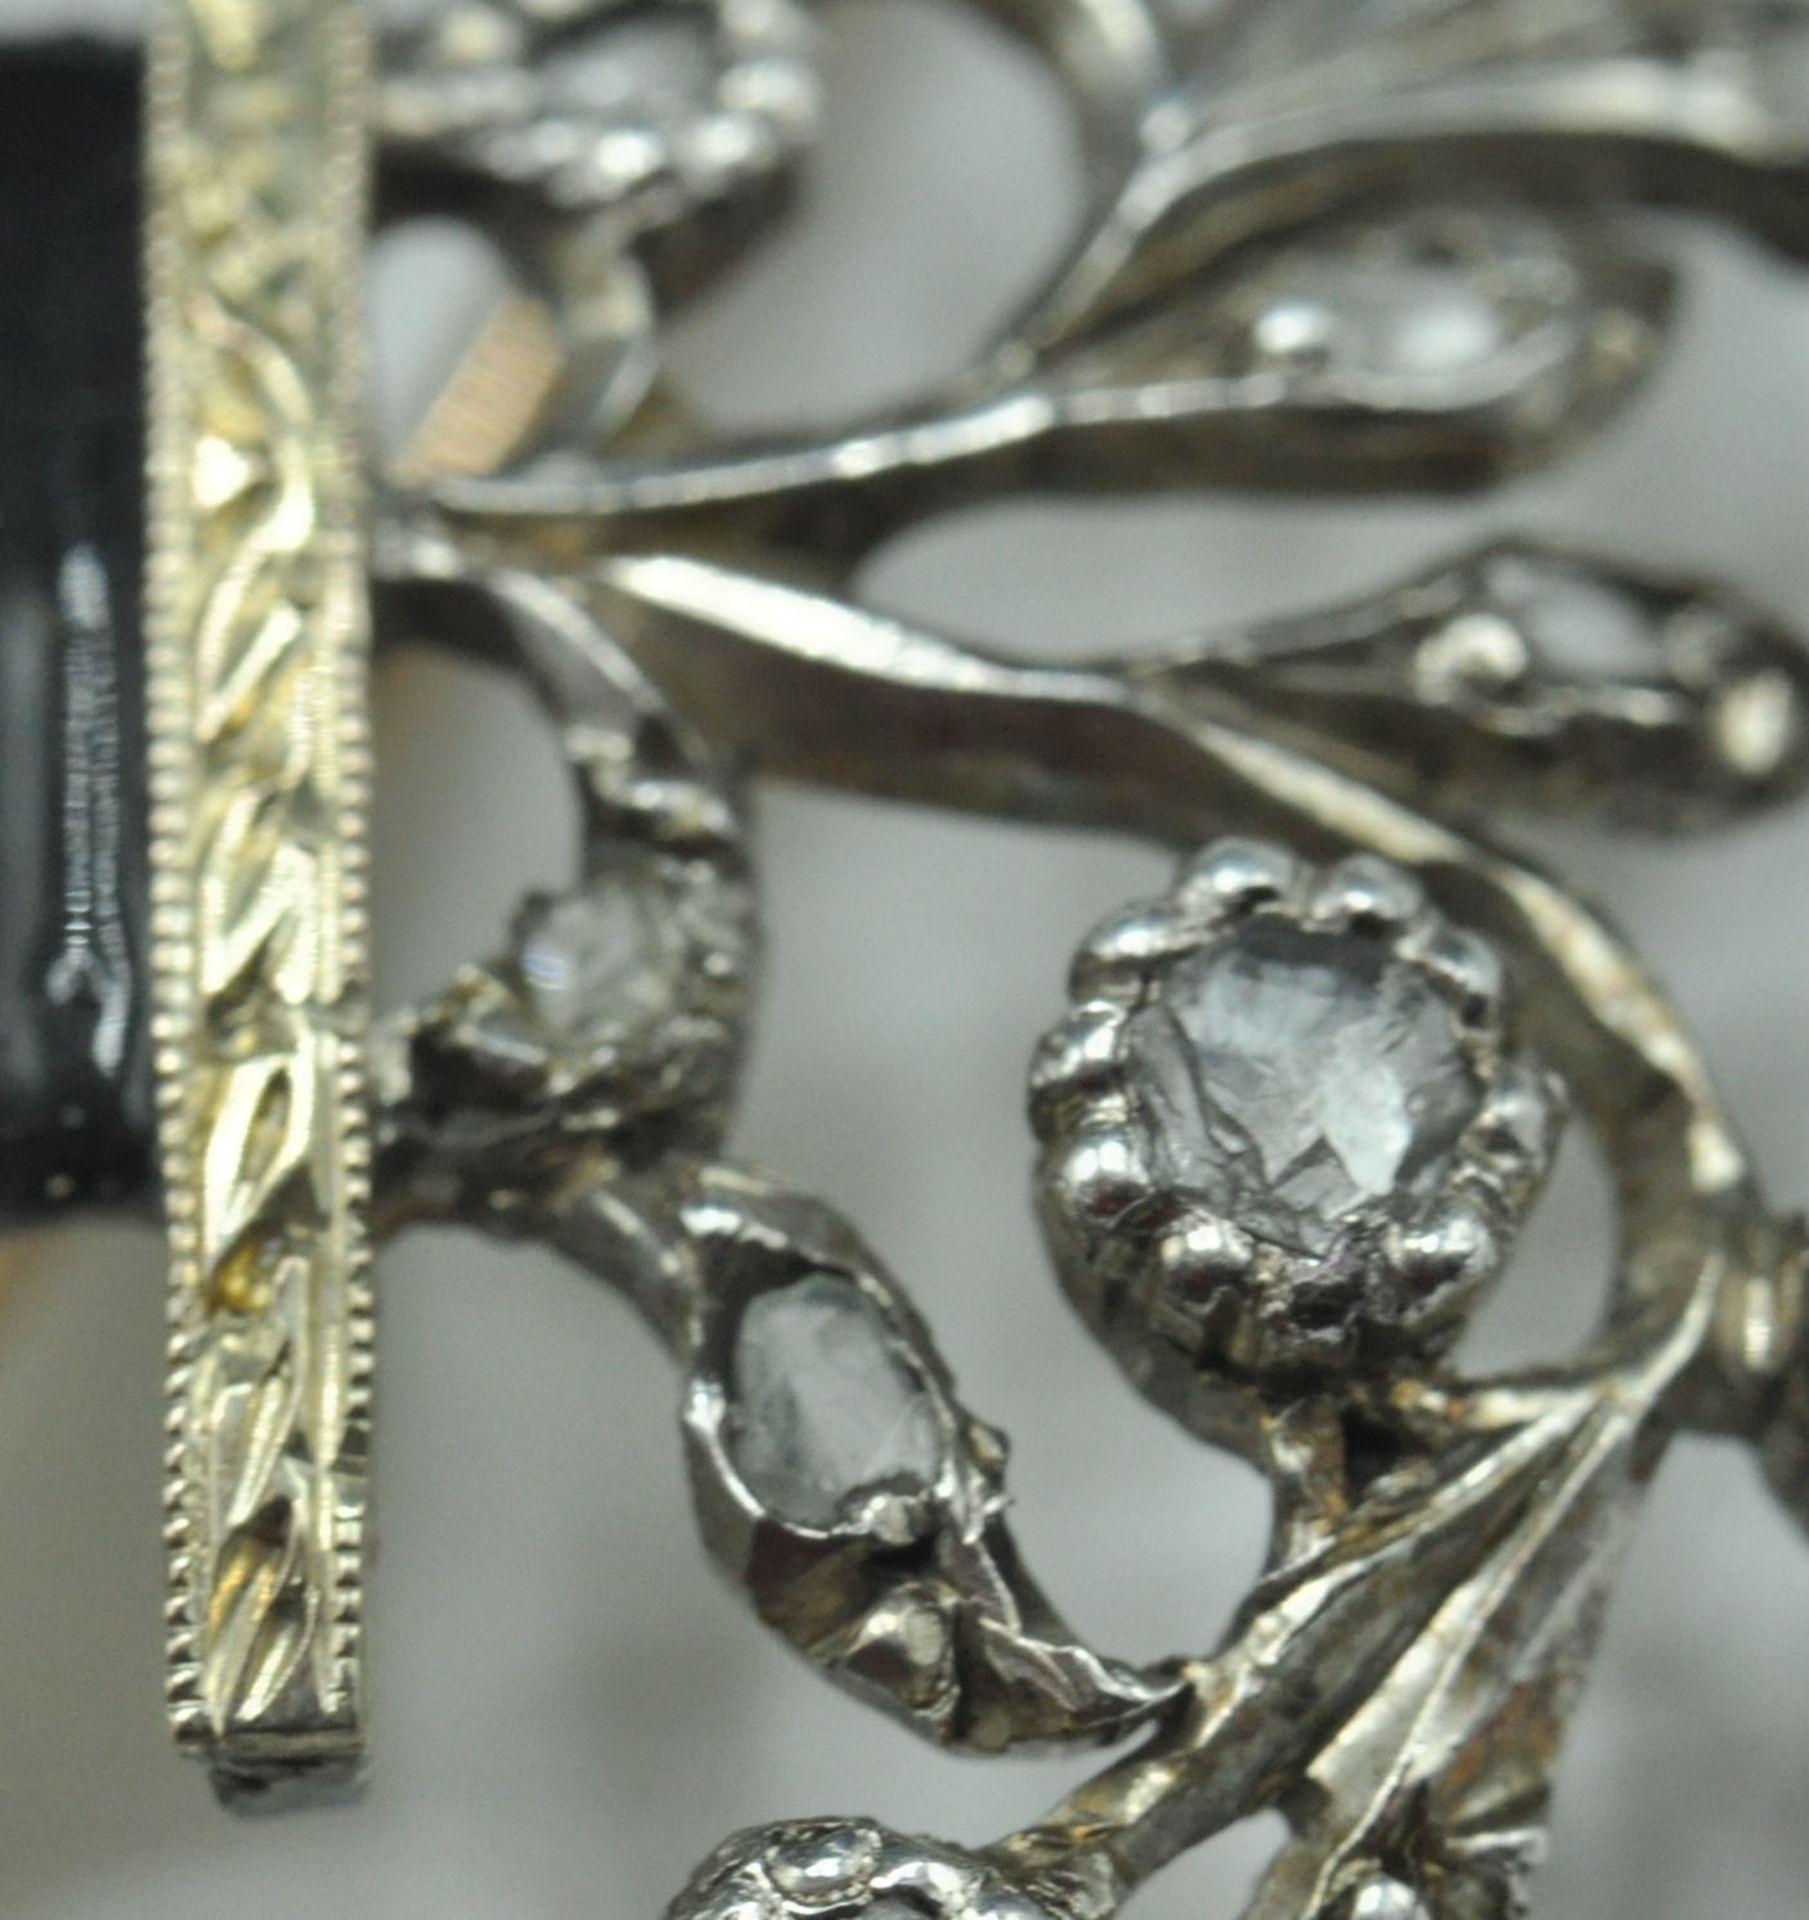 18ct White & Yellow Gold Emerald & Diamond Jardiniere Brooch - Image 4 of 9